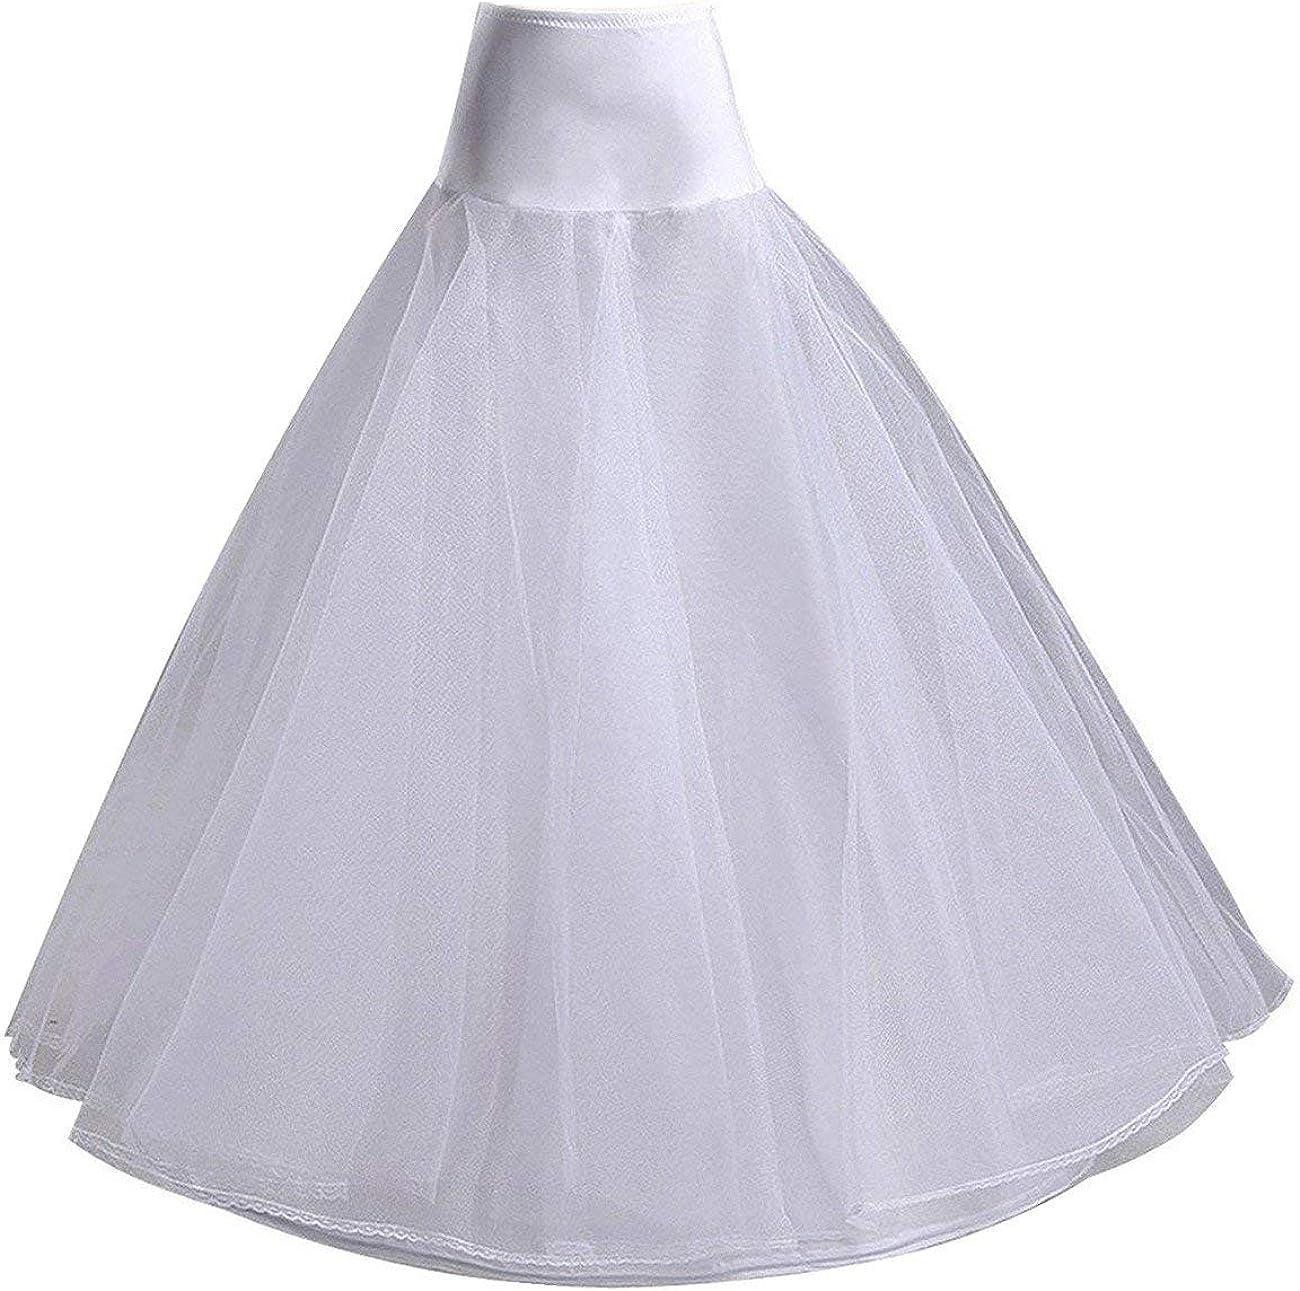 Women's Full Lenth A-line Underskirt Fort Superlatite Worth Mall Petticoat Wedding Crinoline